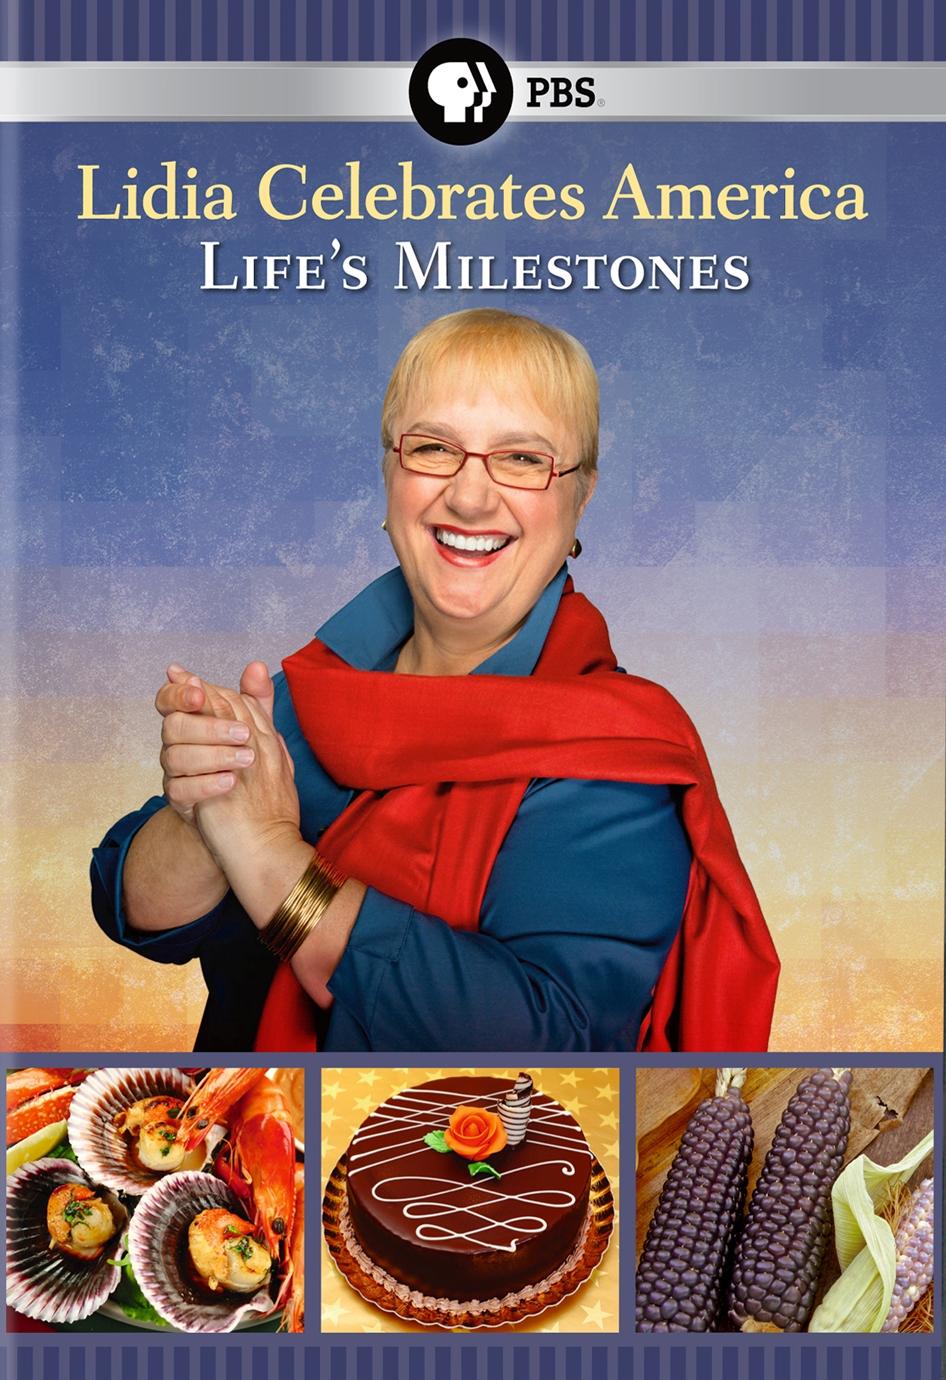 Lidia Celebrates America: Life's Milestones